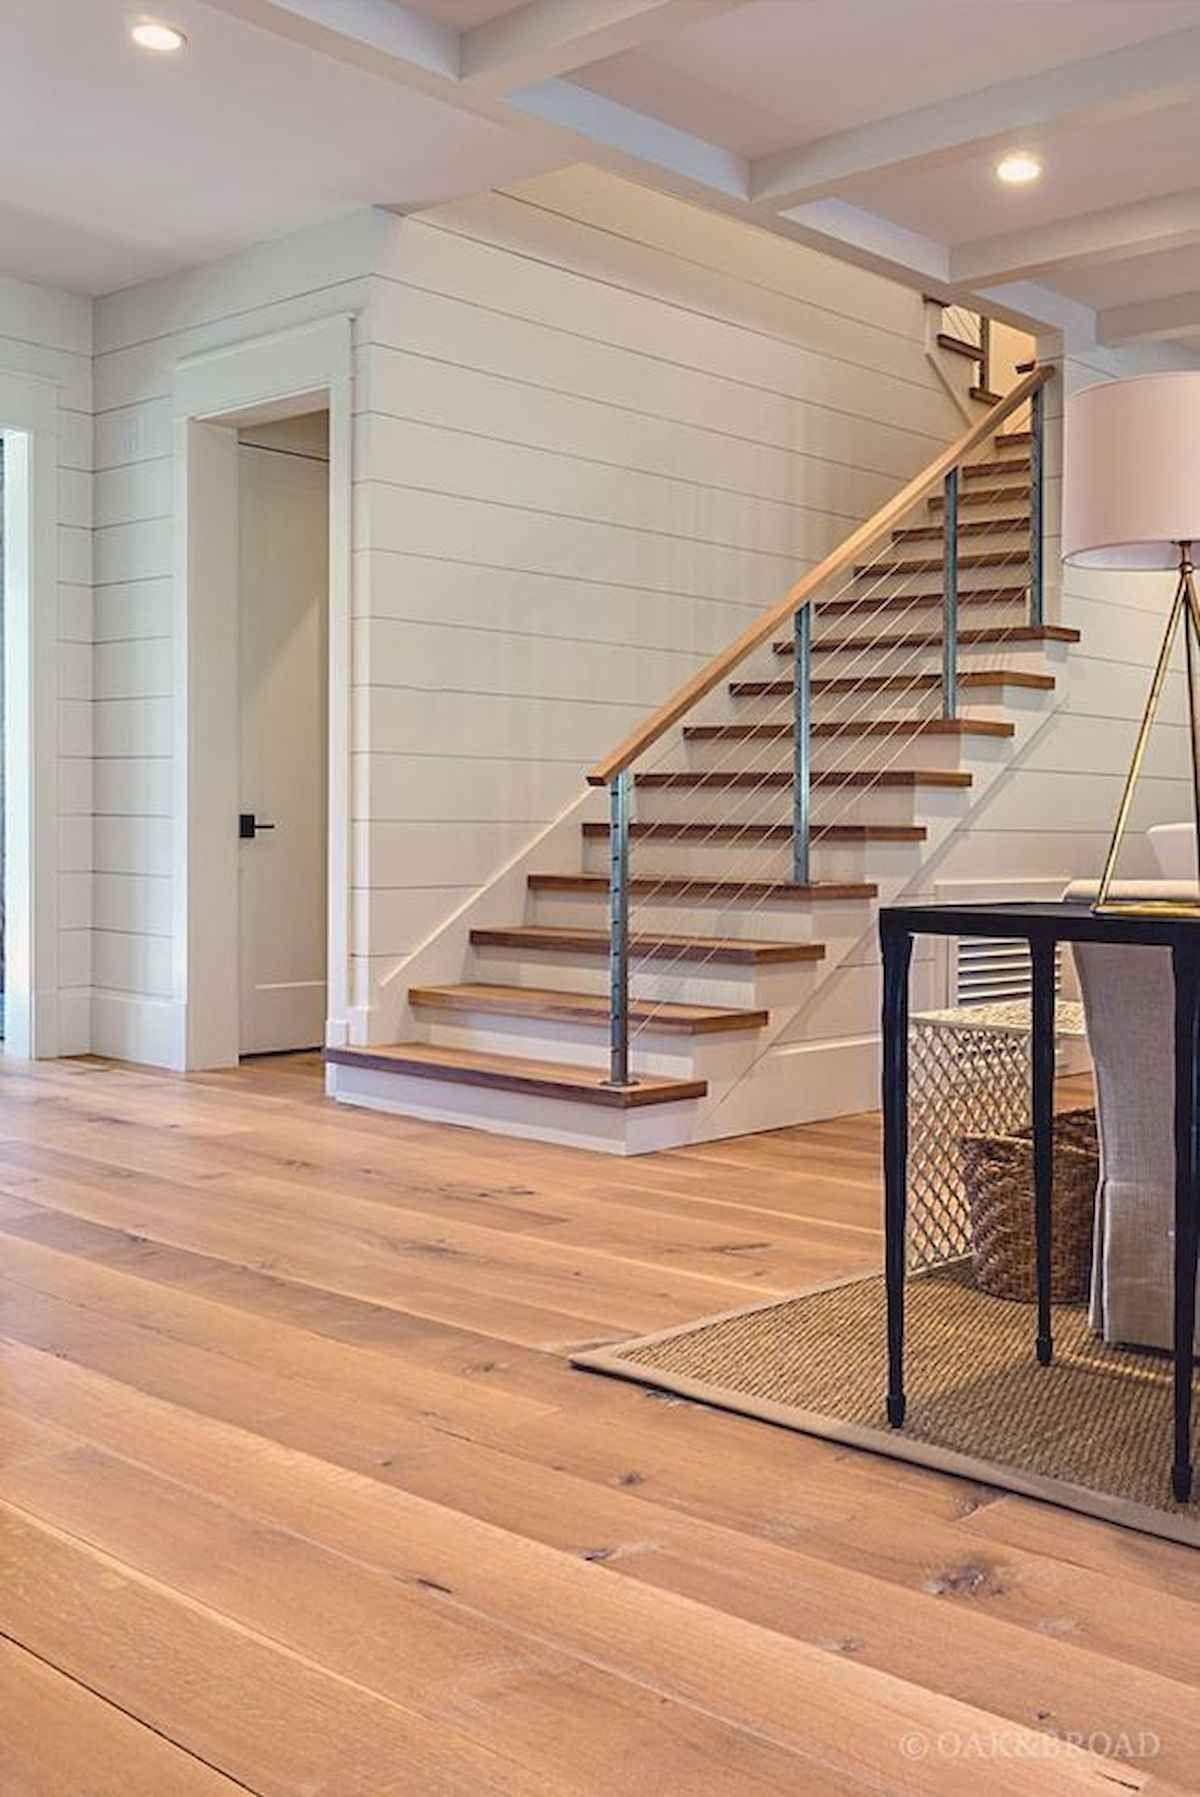 Tiles Design For Living Room Wall: Popular Wall Paneling Design Ideas For Living Room